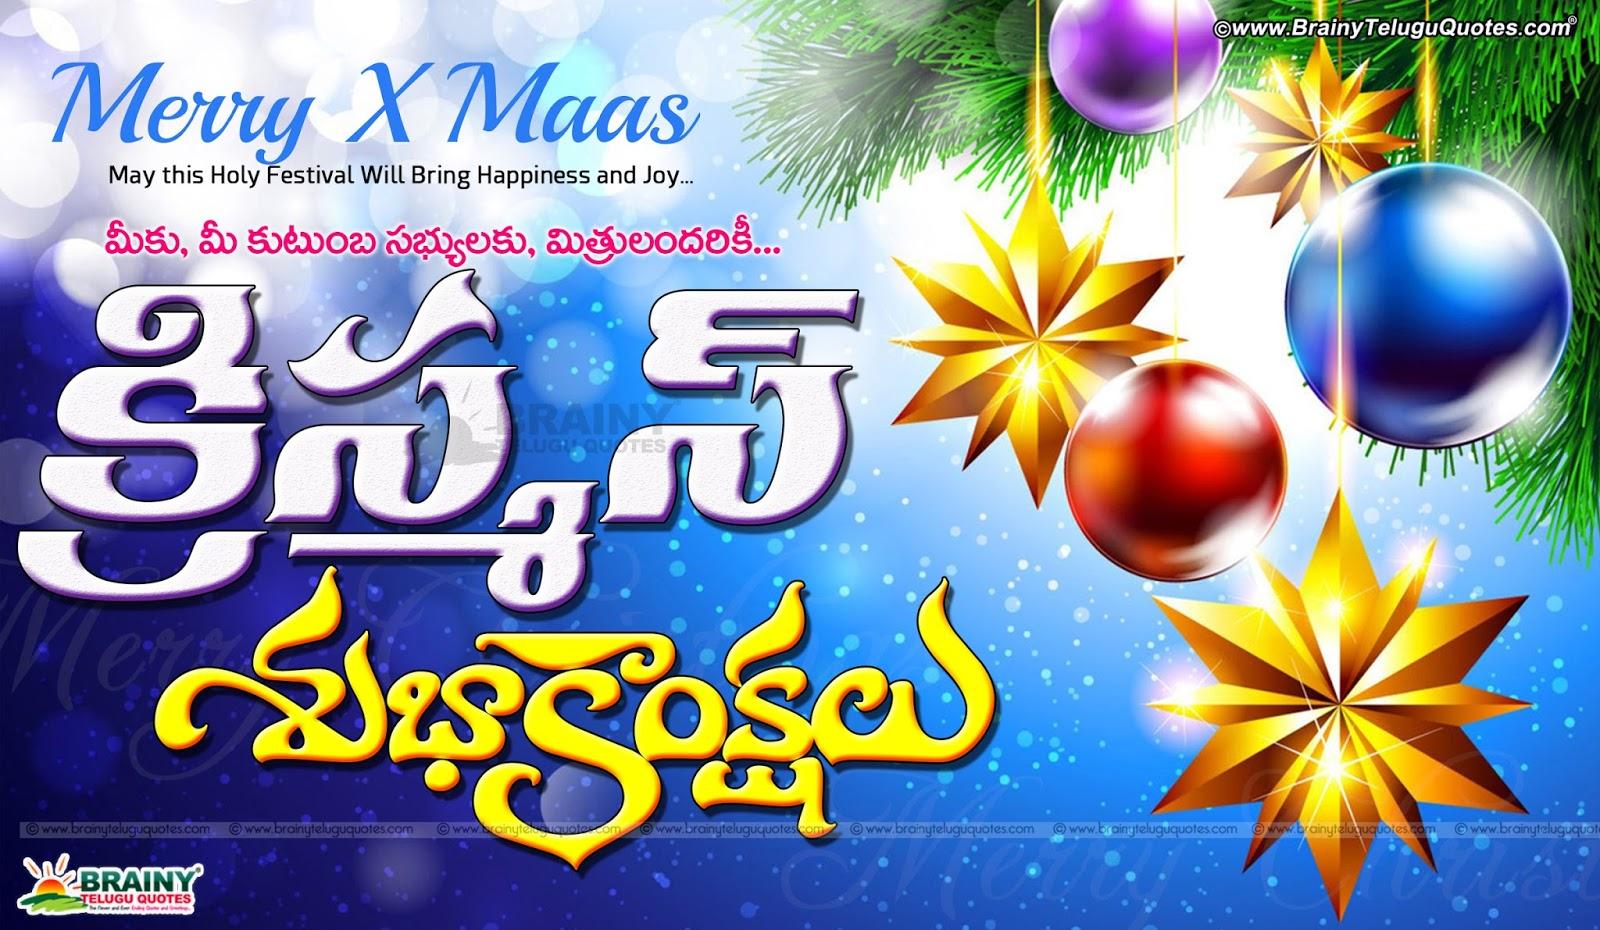 Merry Christmas Telugu Online Greetings with Hd Wallpapers